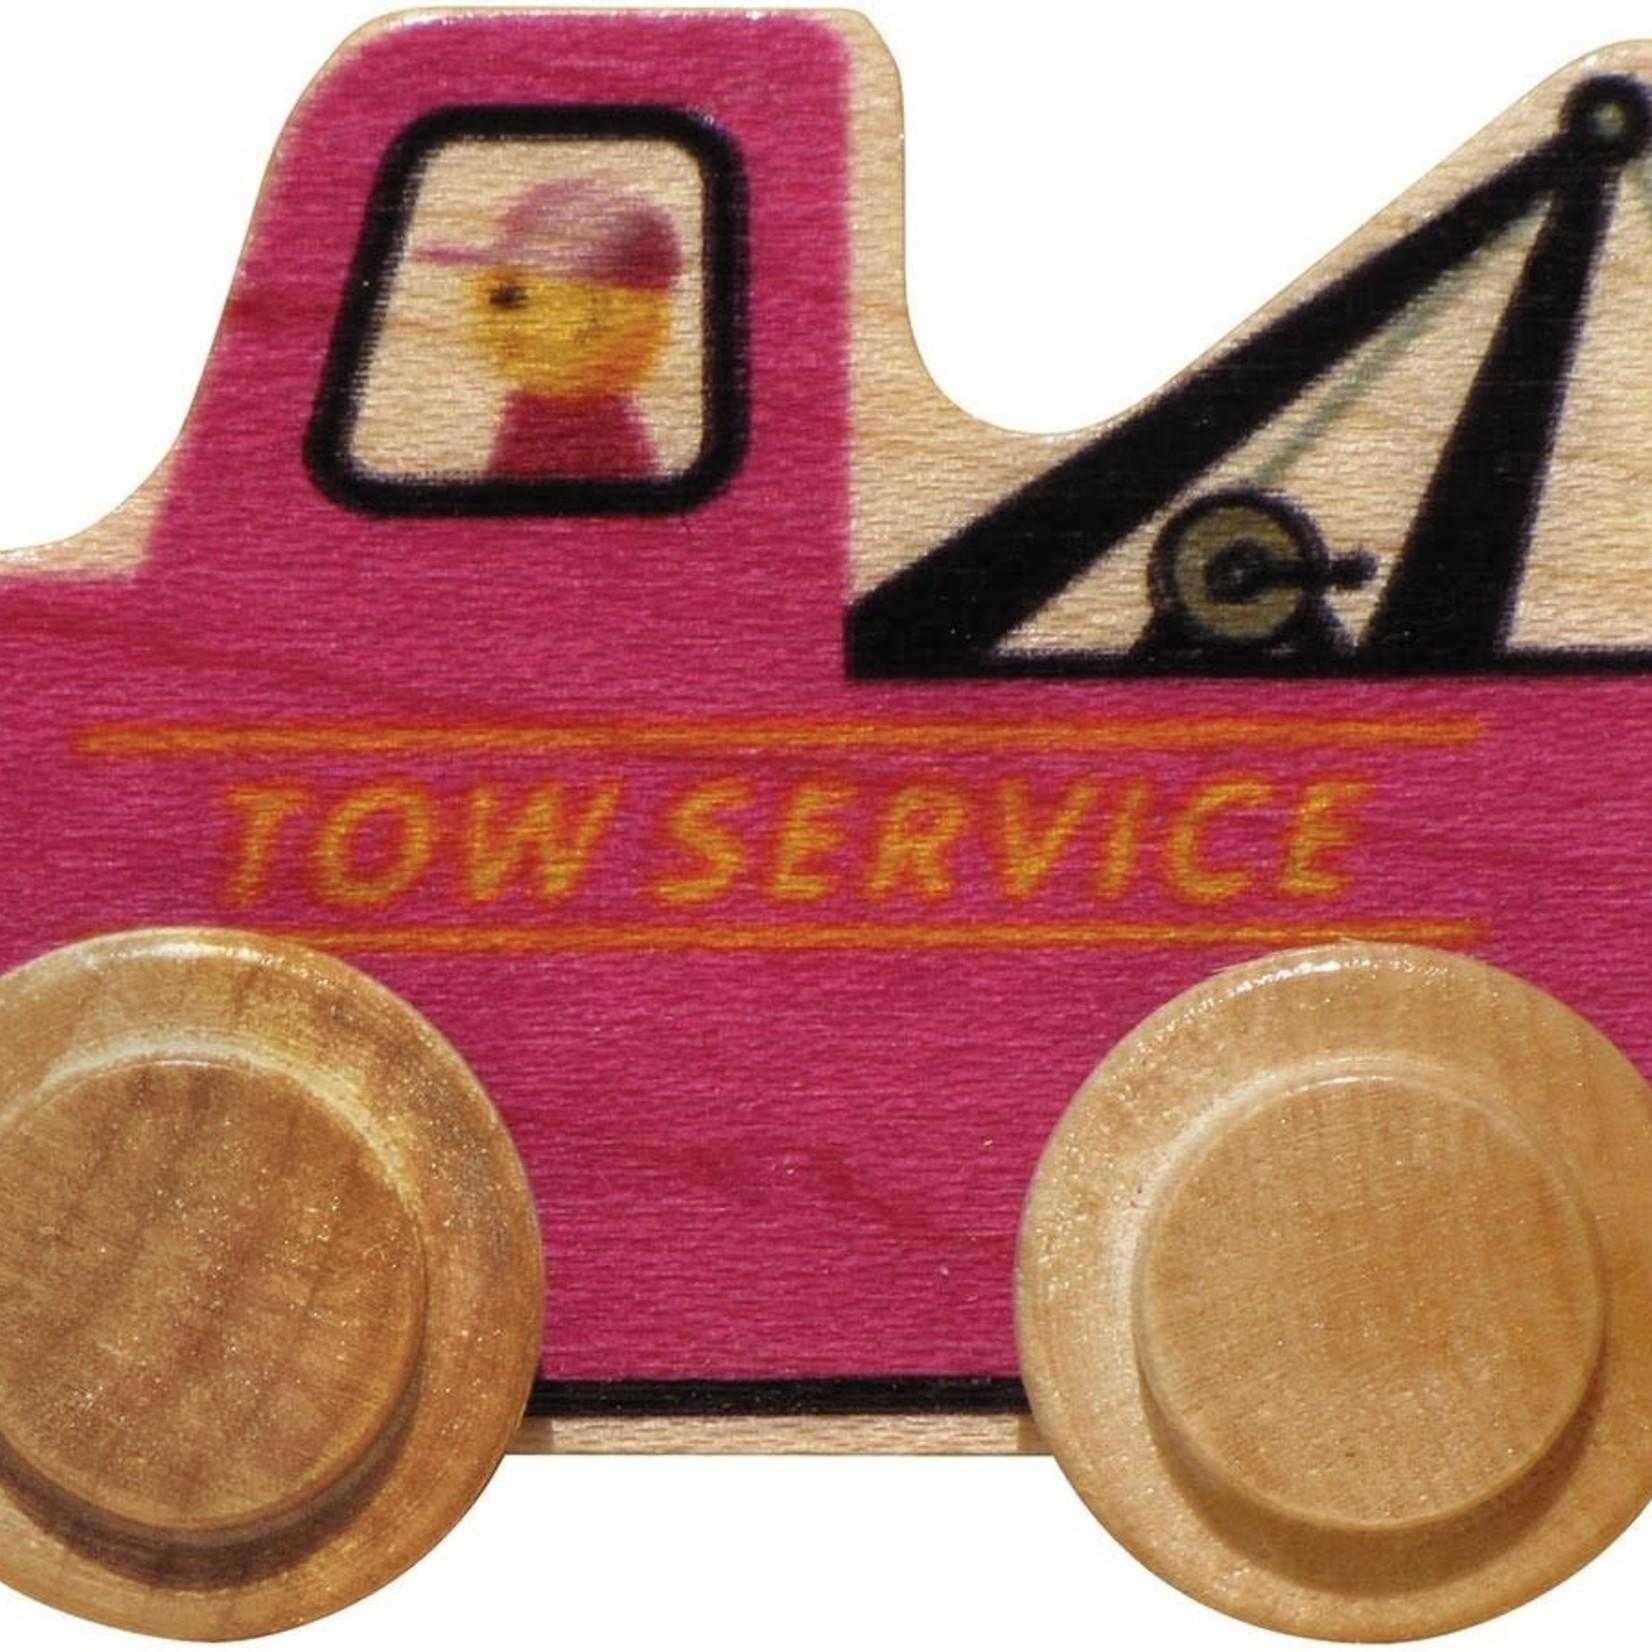 Maple Landmark Name Train - Tow Truck